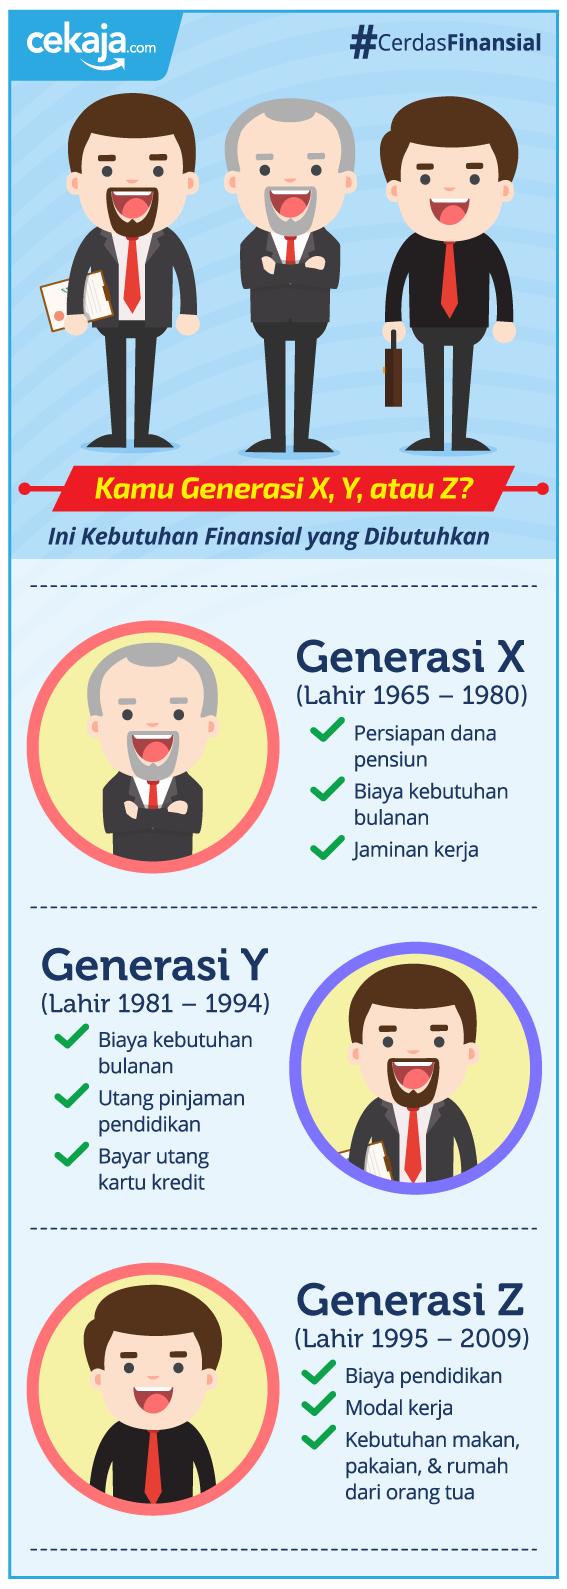 infografis-tips finansial generasi x - CekAja.com